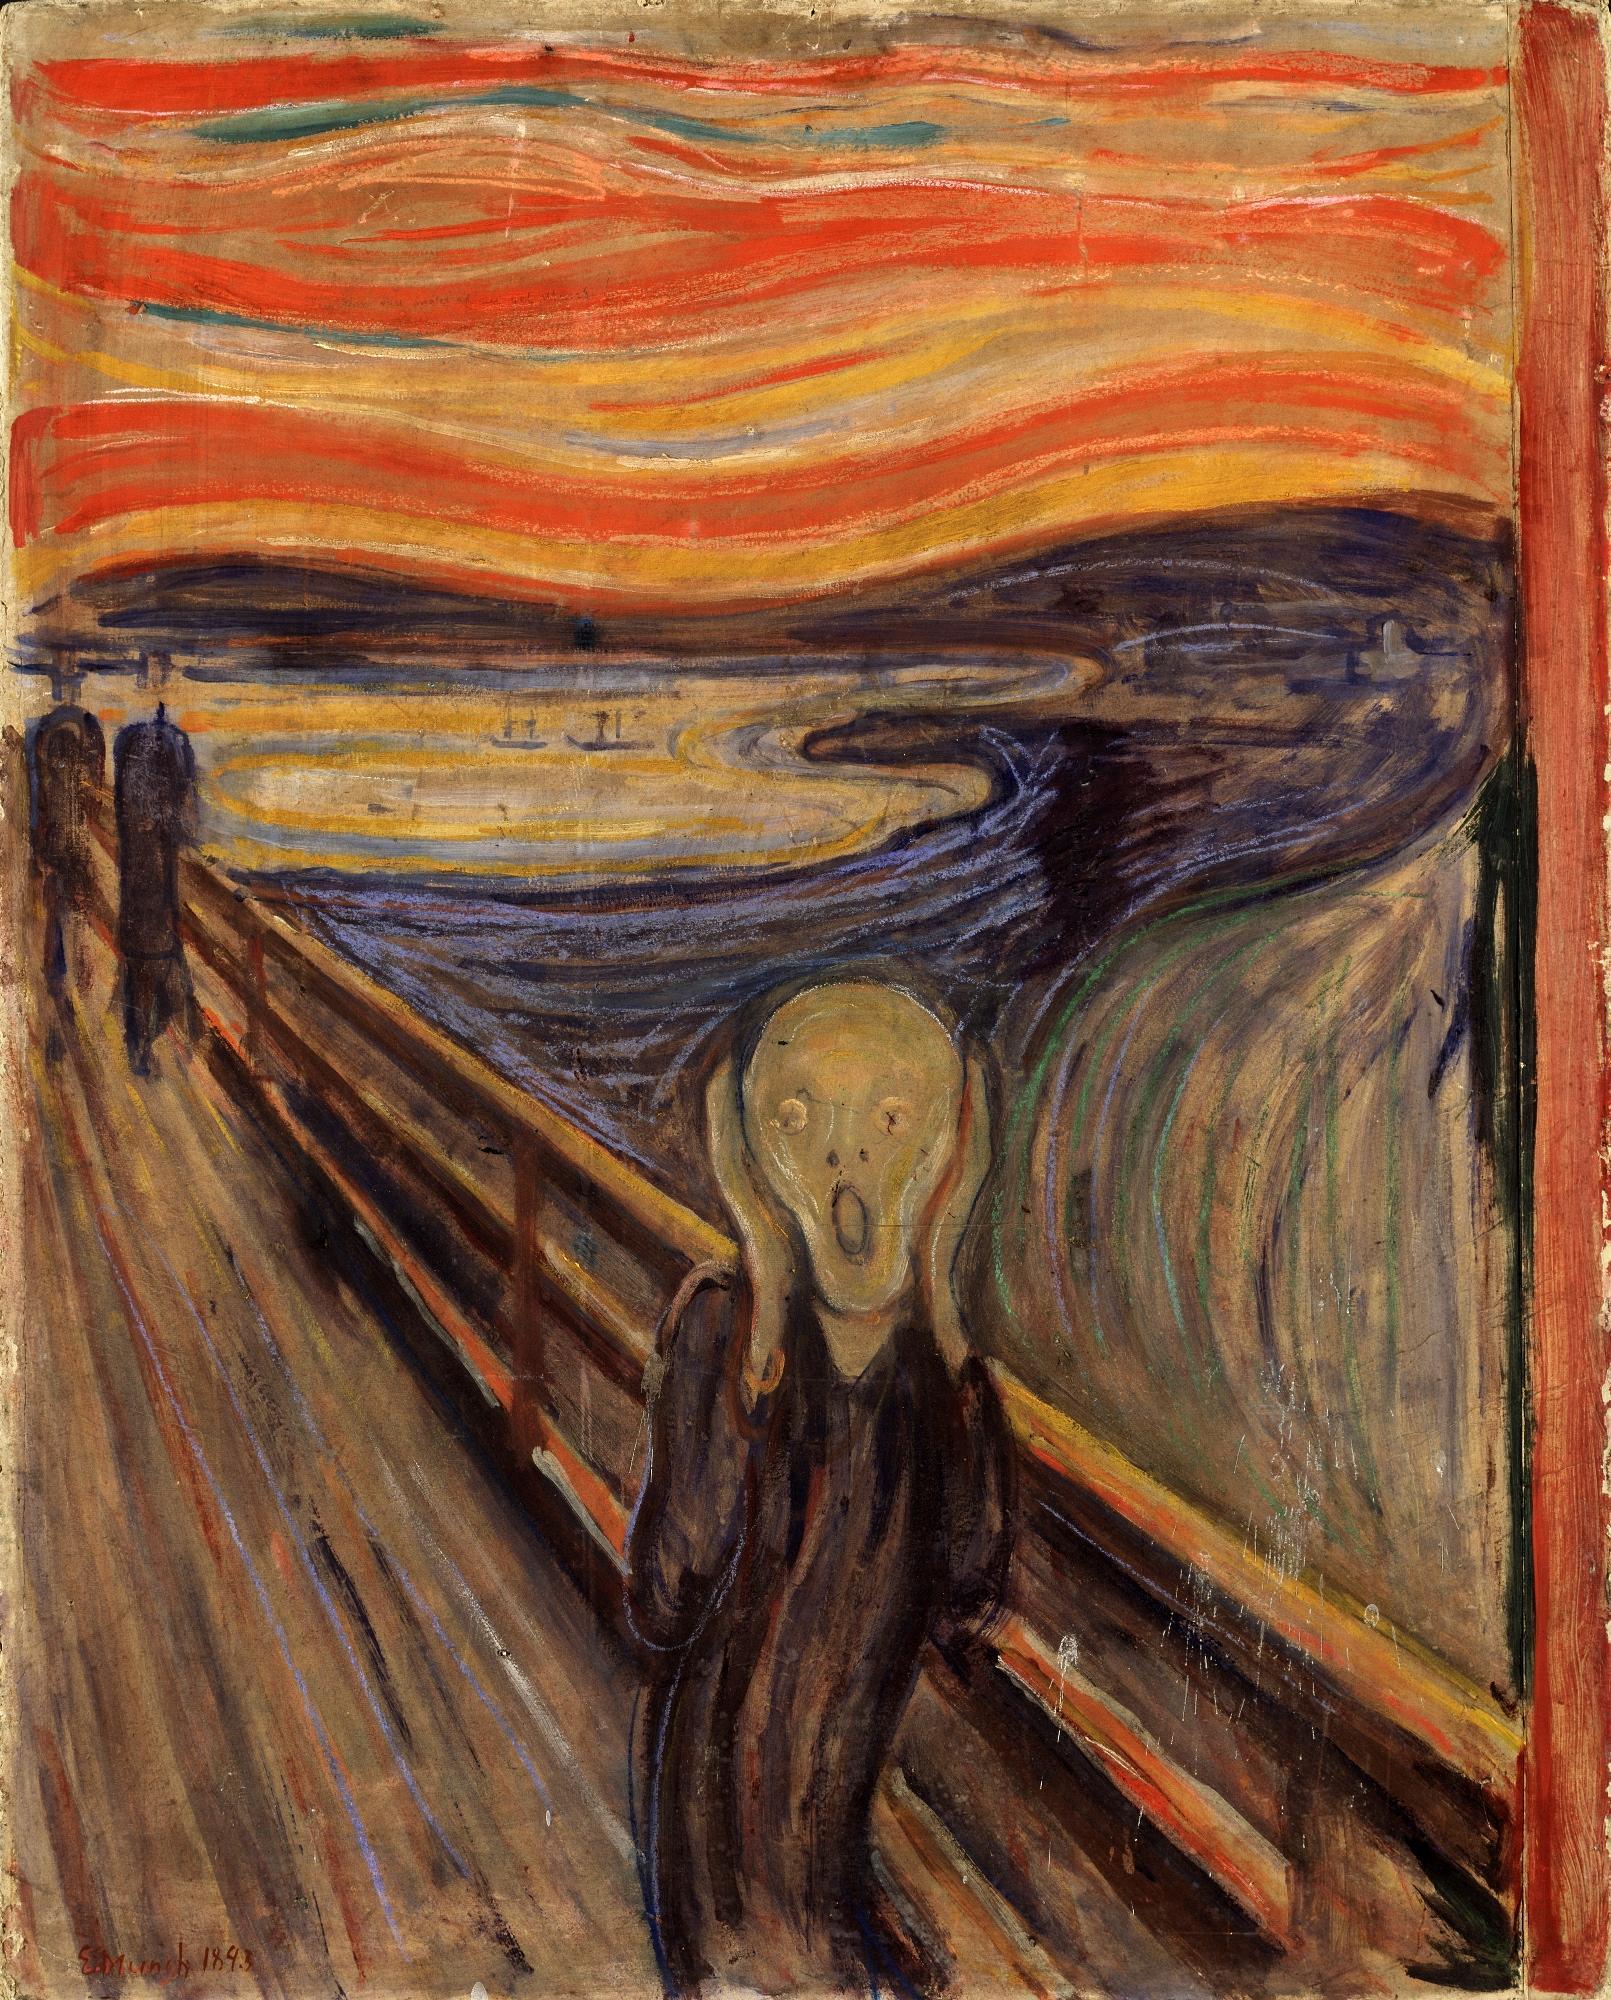 Edvard Munch. The scream. 1893.